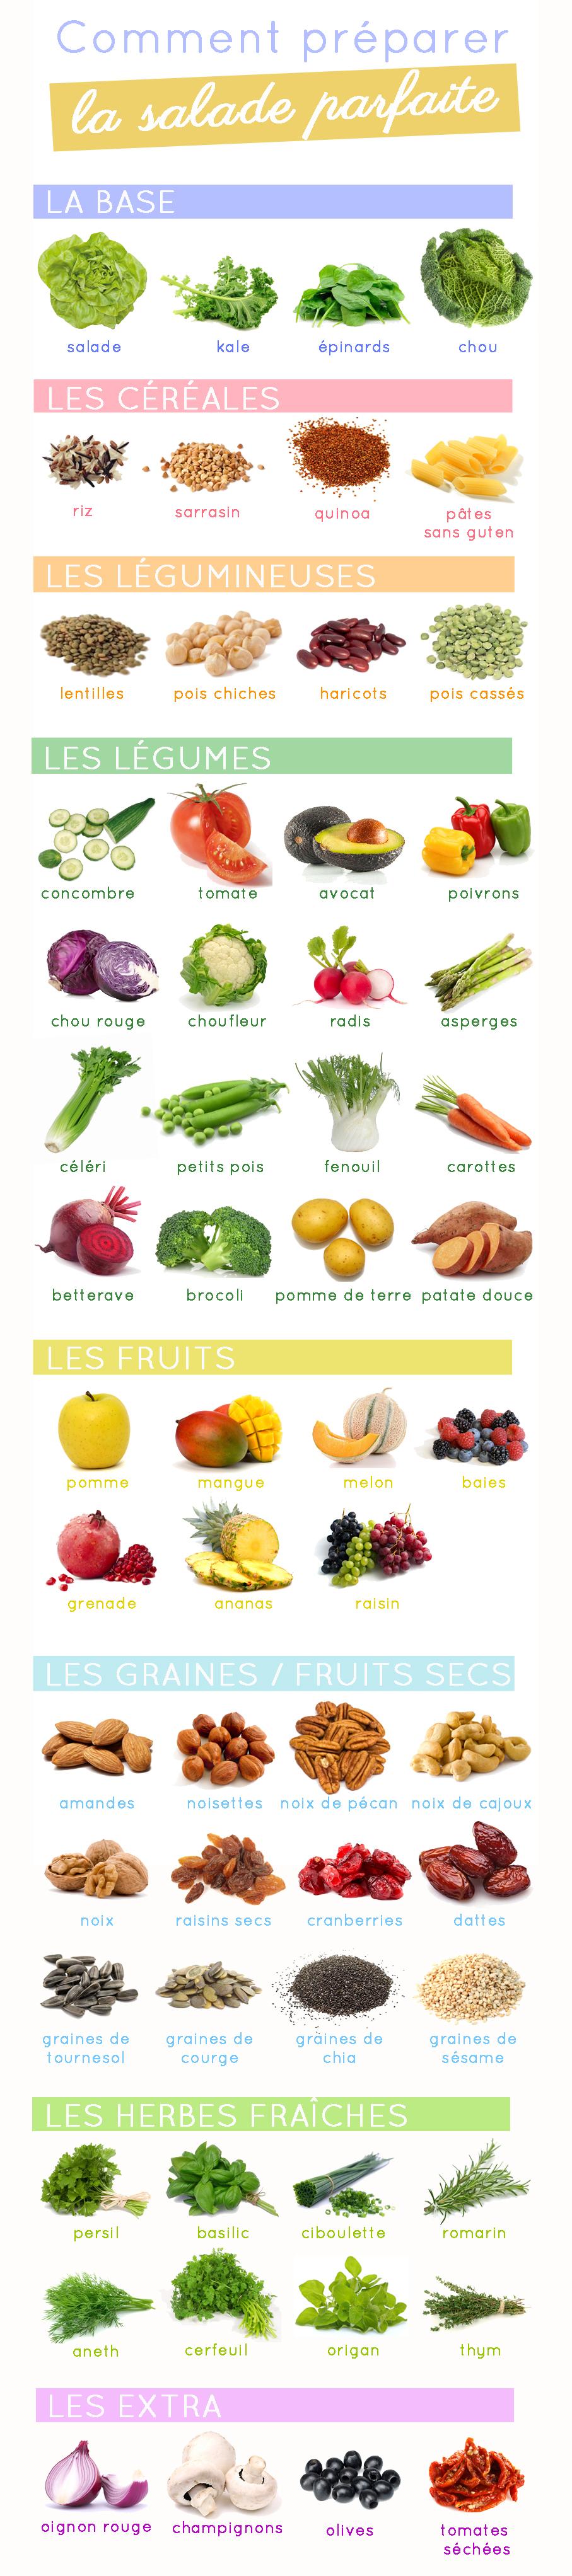 idées salades vegan sans gluten